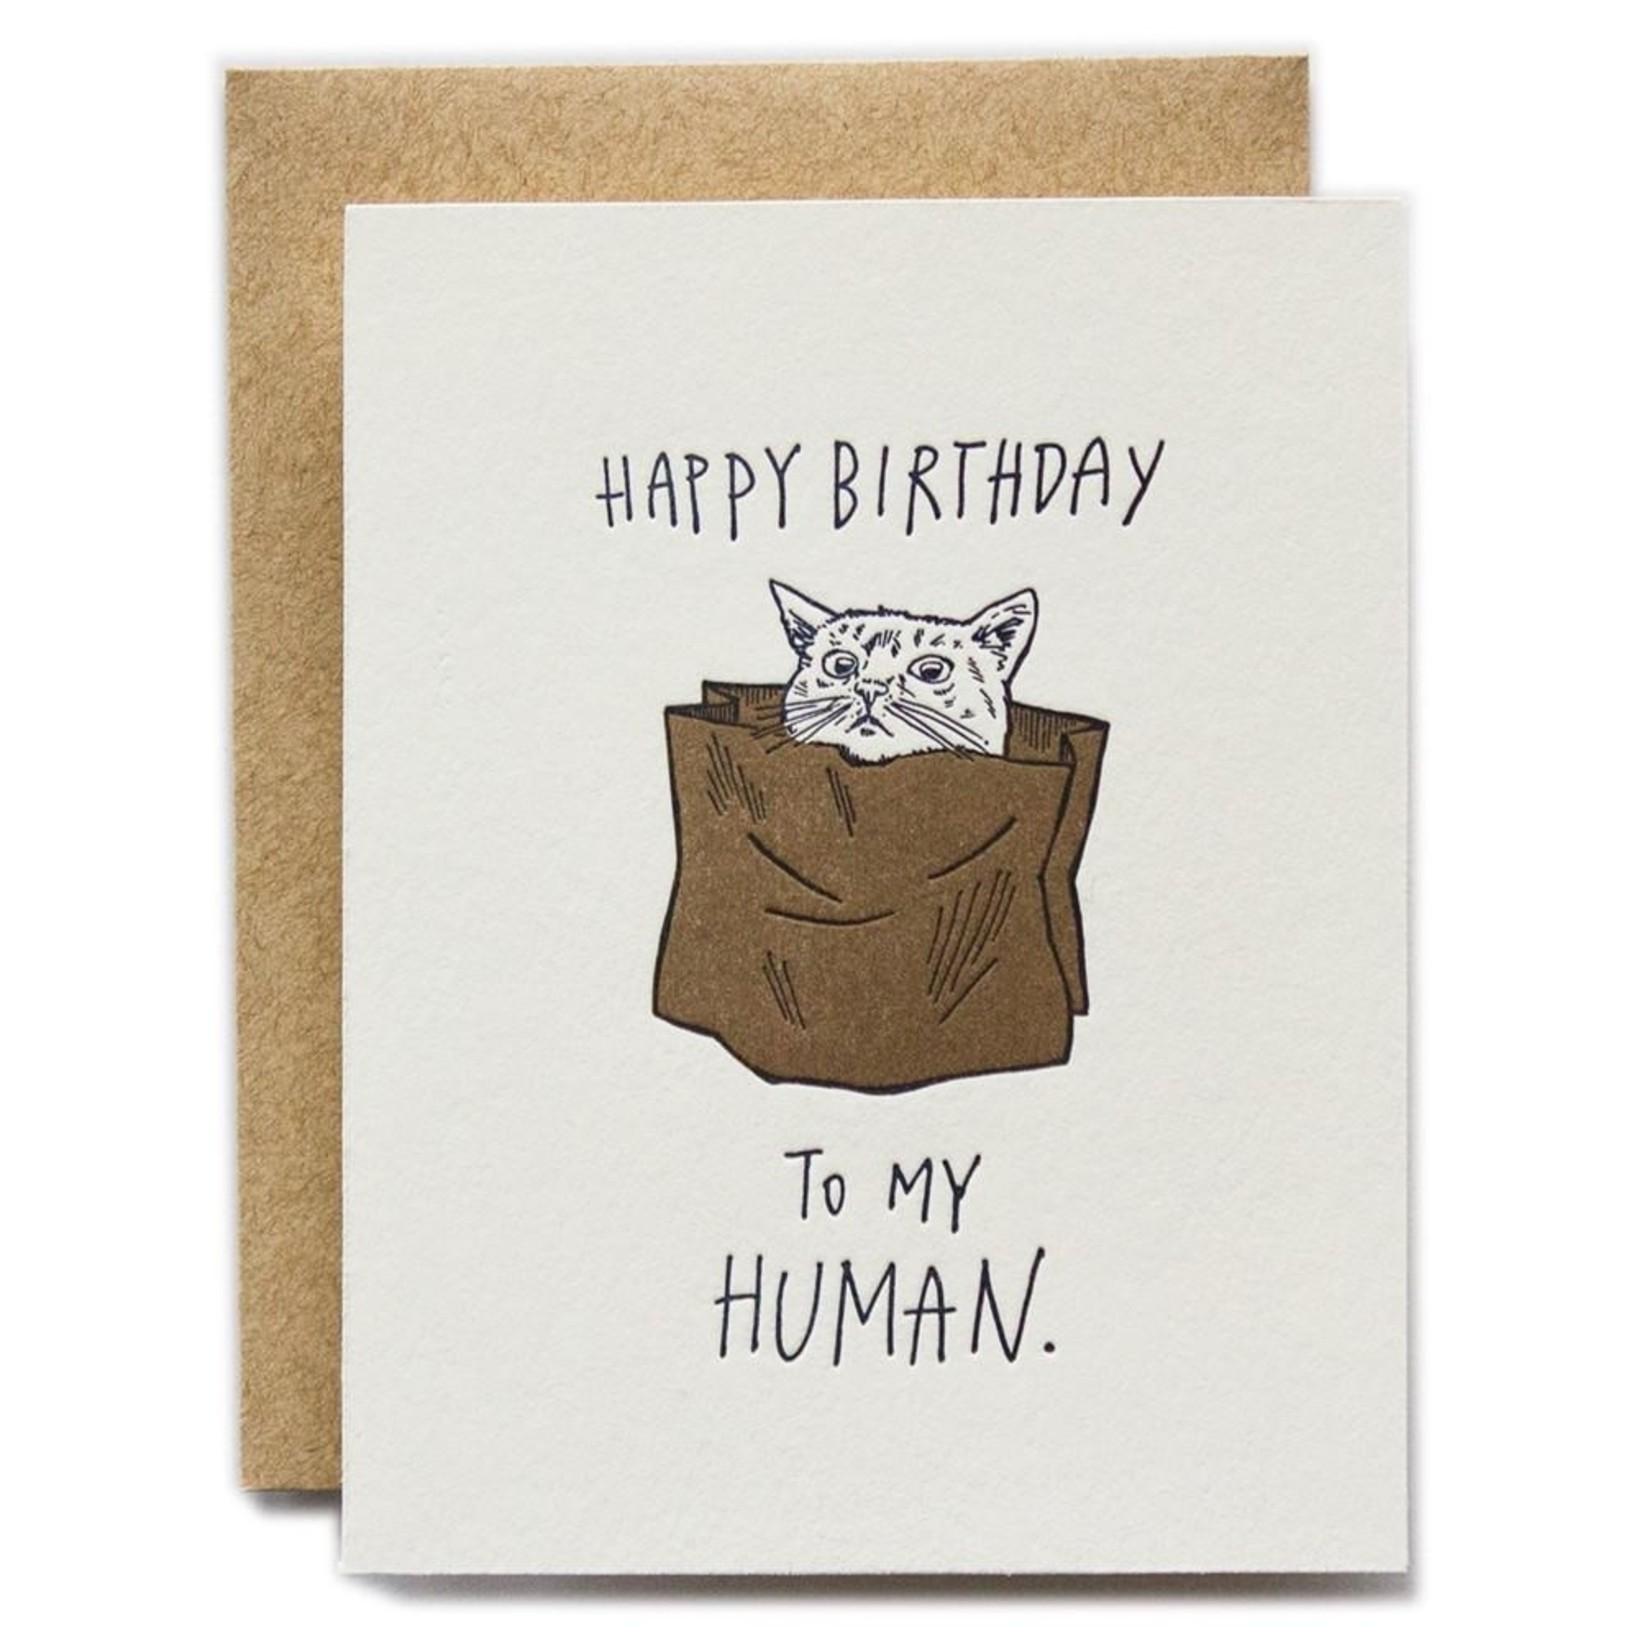 Ladyfingers Letterpress Ladyfingers Happy Birthday To My Human Cat